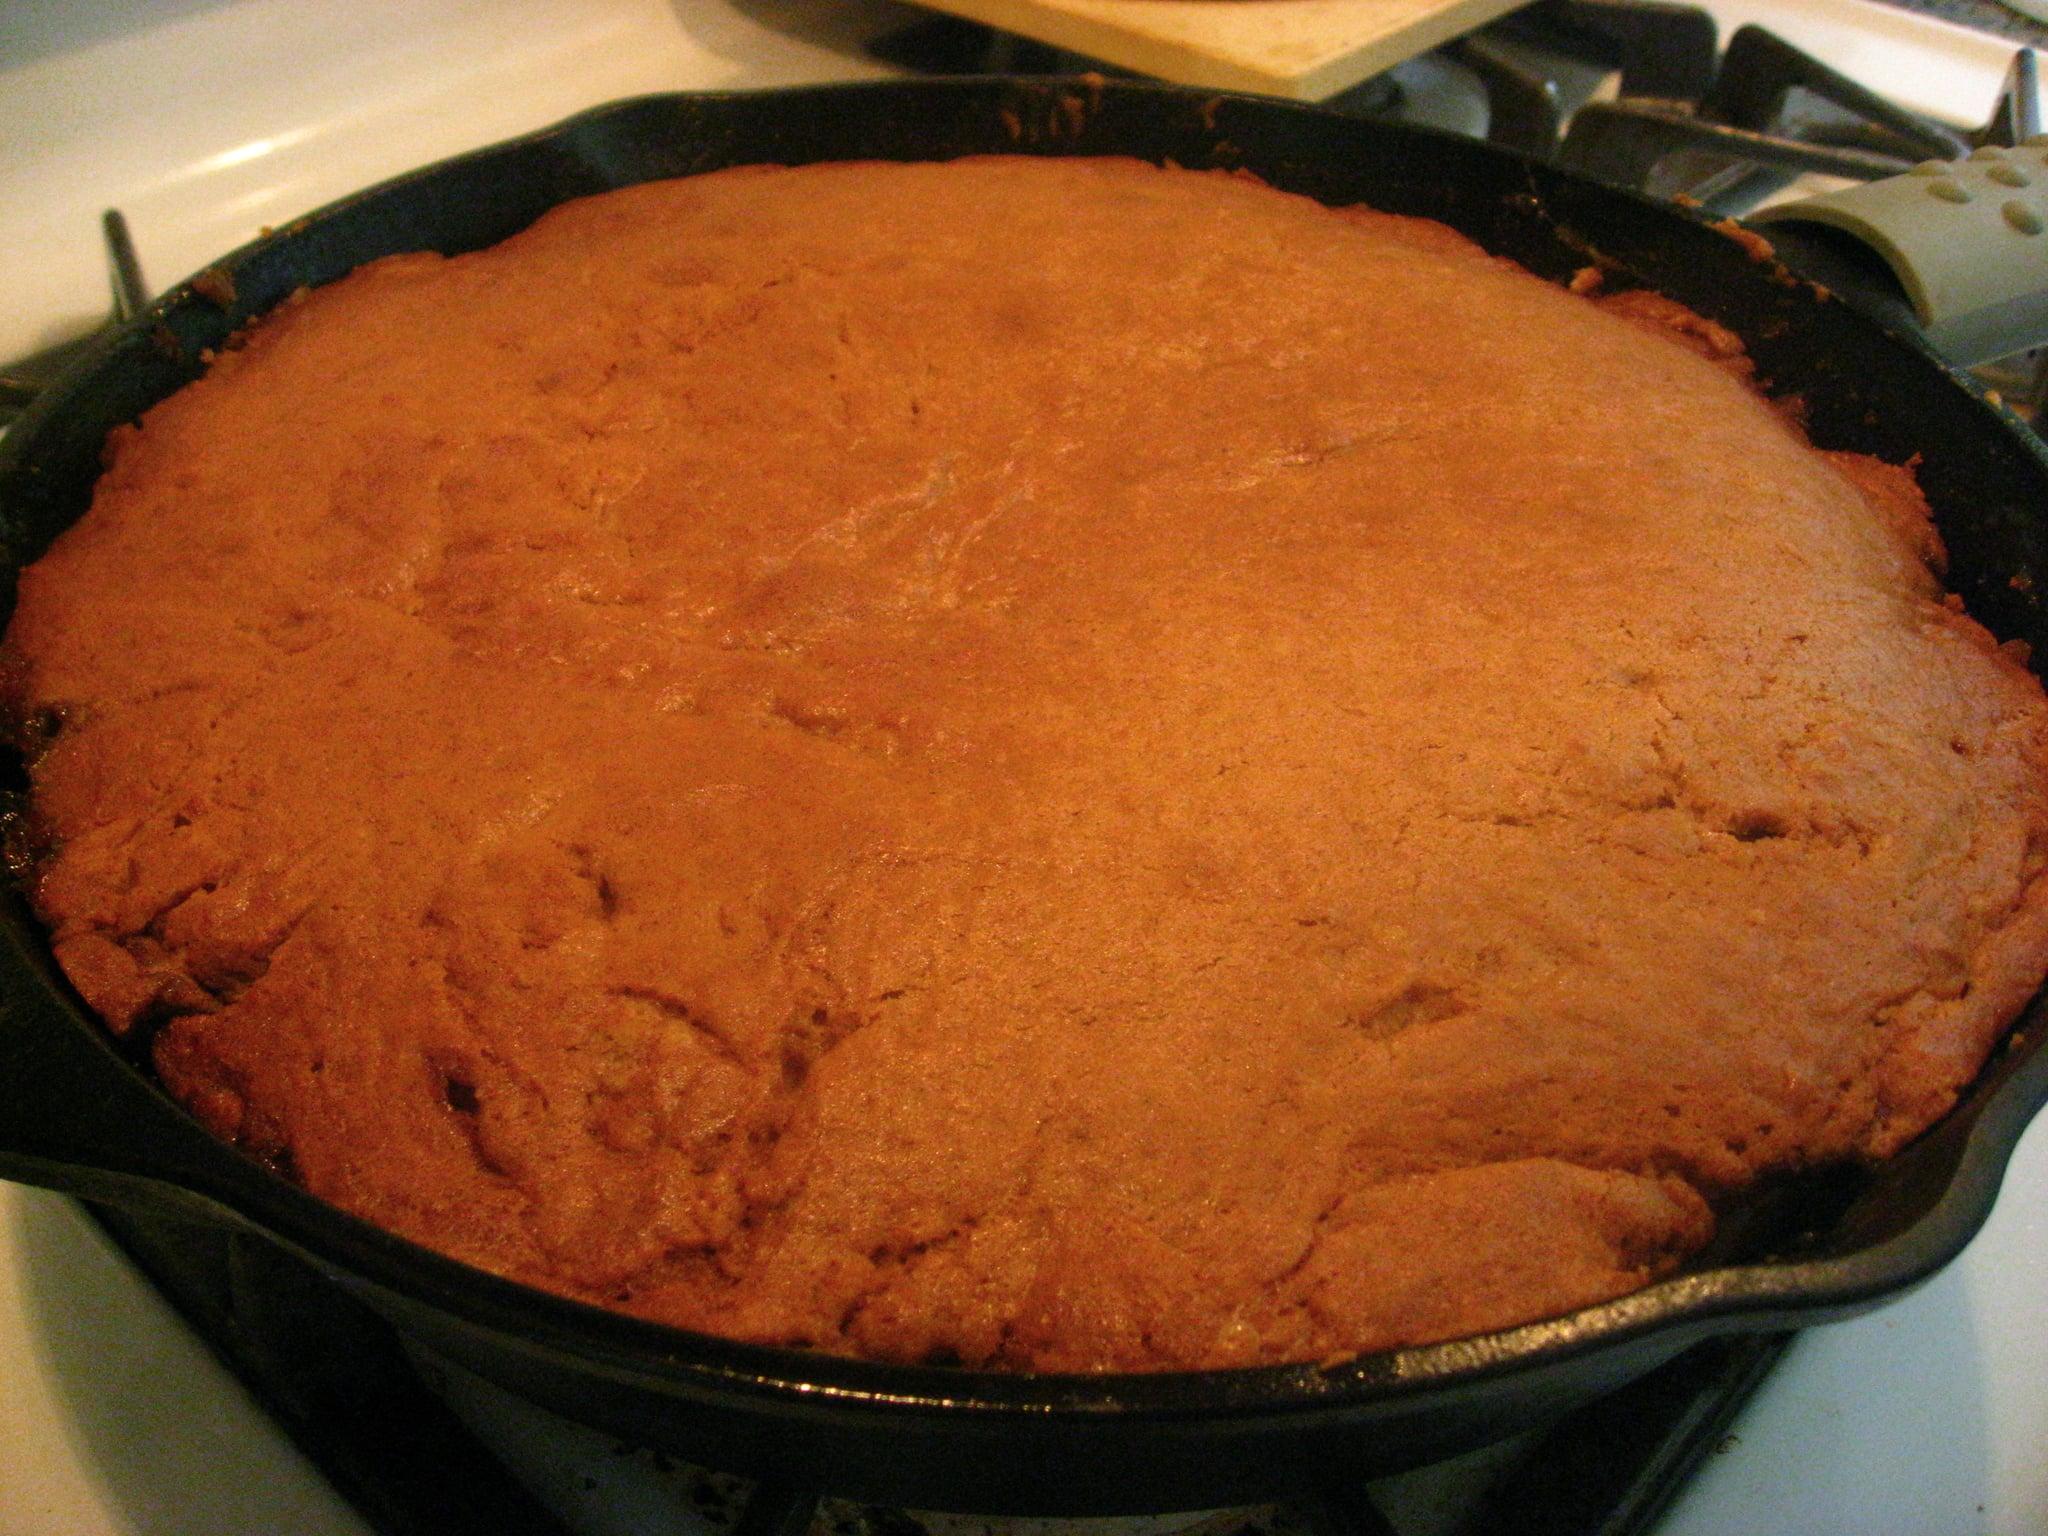 52 Weeks Of Baking Ginger Peach Upside Down Cake